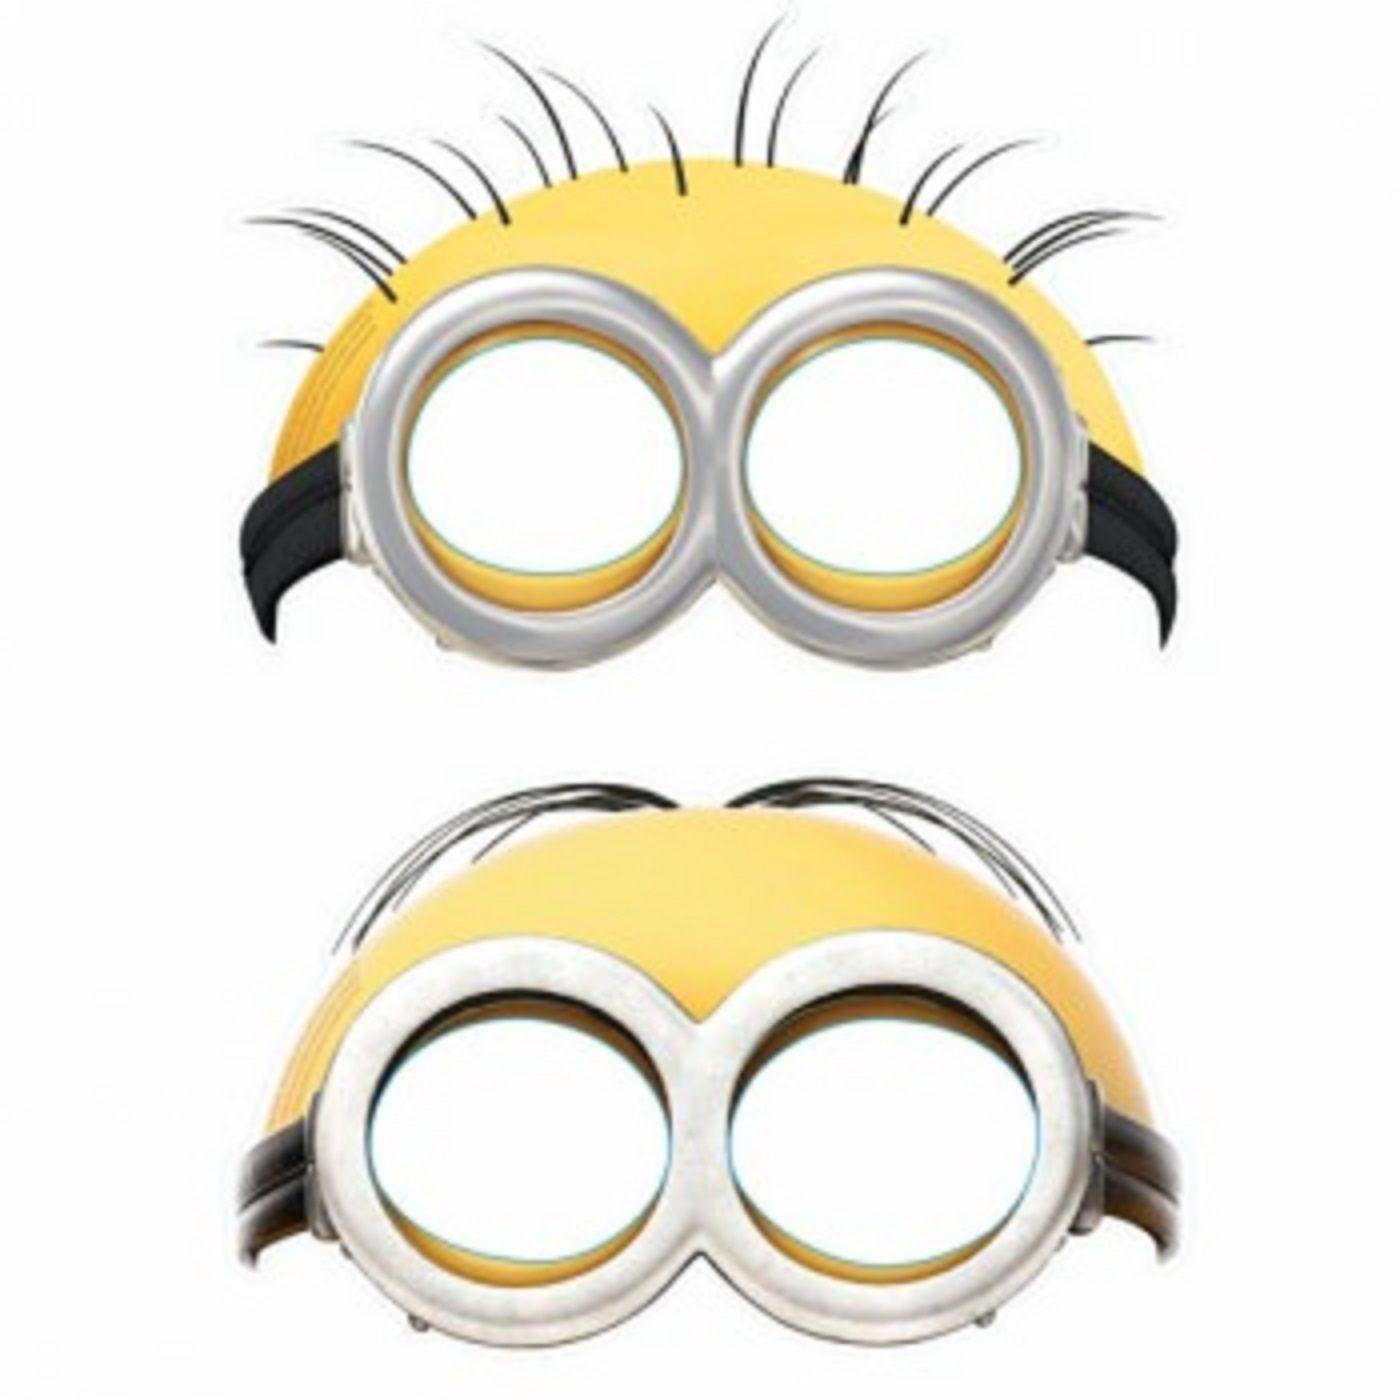 Despicable Me Minions Party Supplies Paper Masks Party Favours 6 Pack Minion Mask Minion Party Minion Party Supplies